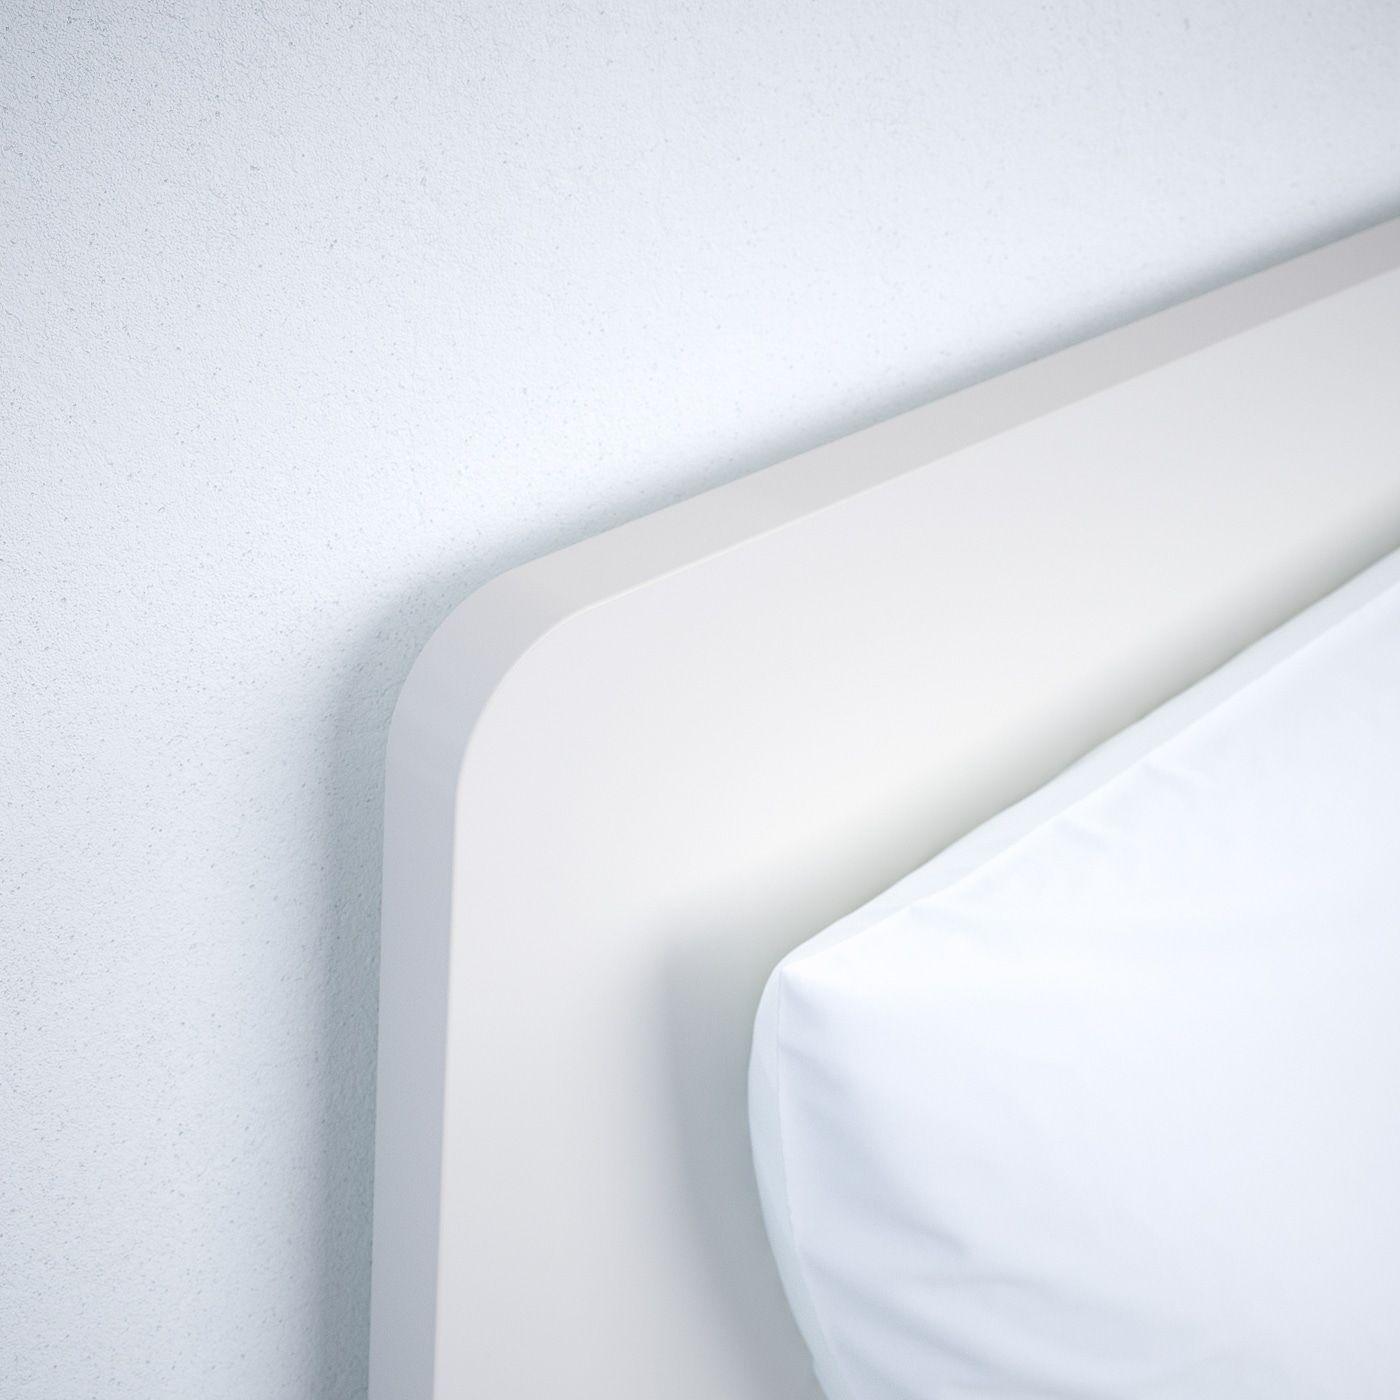 IKEA ASKVOLL Bed frame white, Lönset in 2020 Bed frame